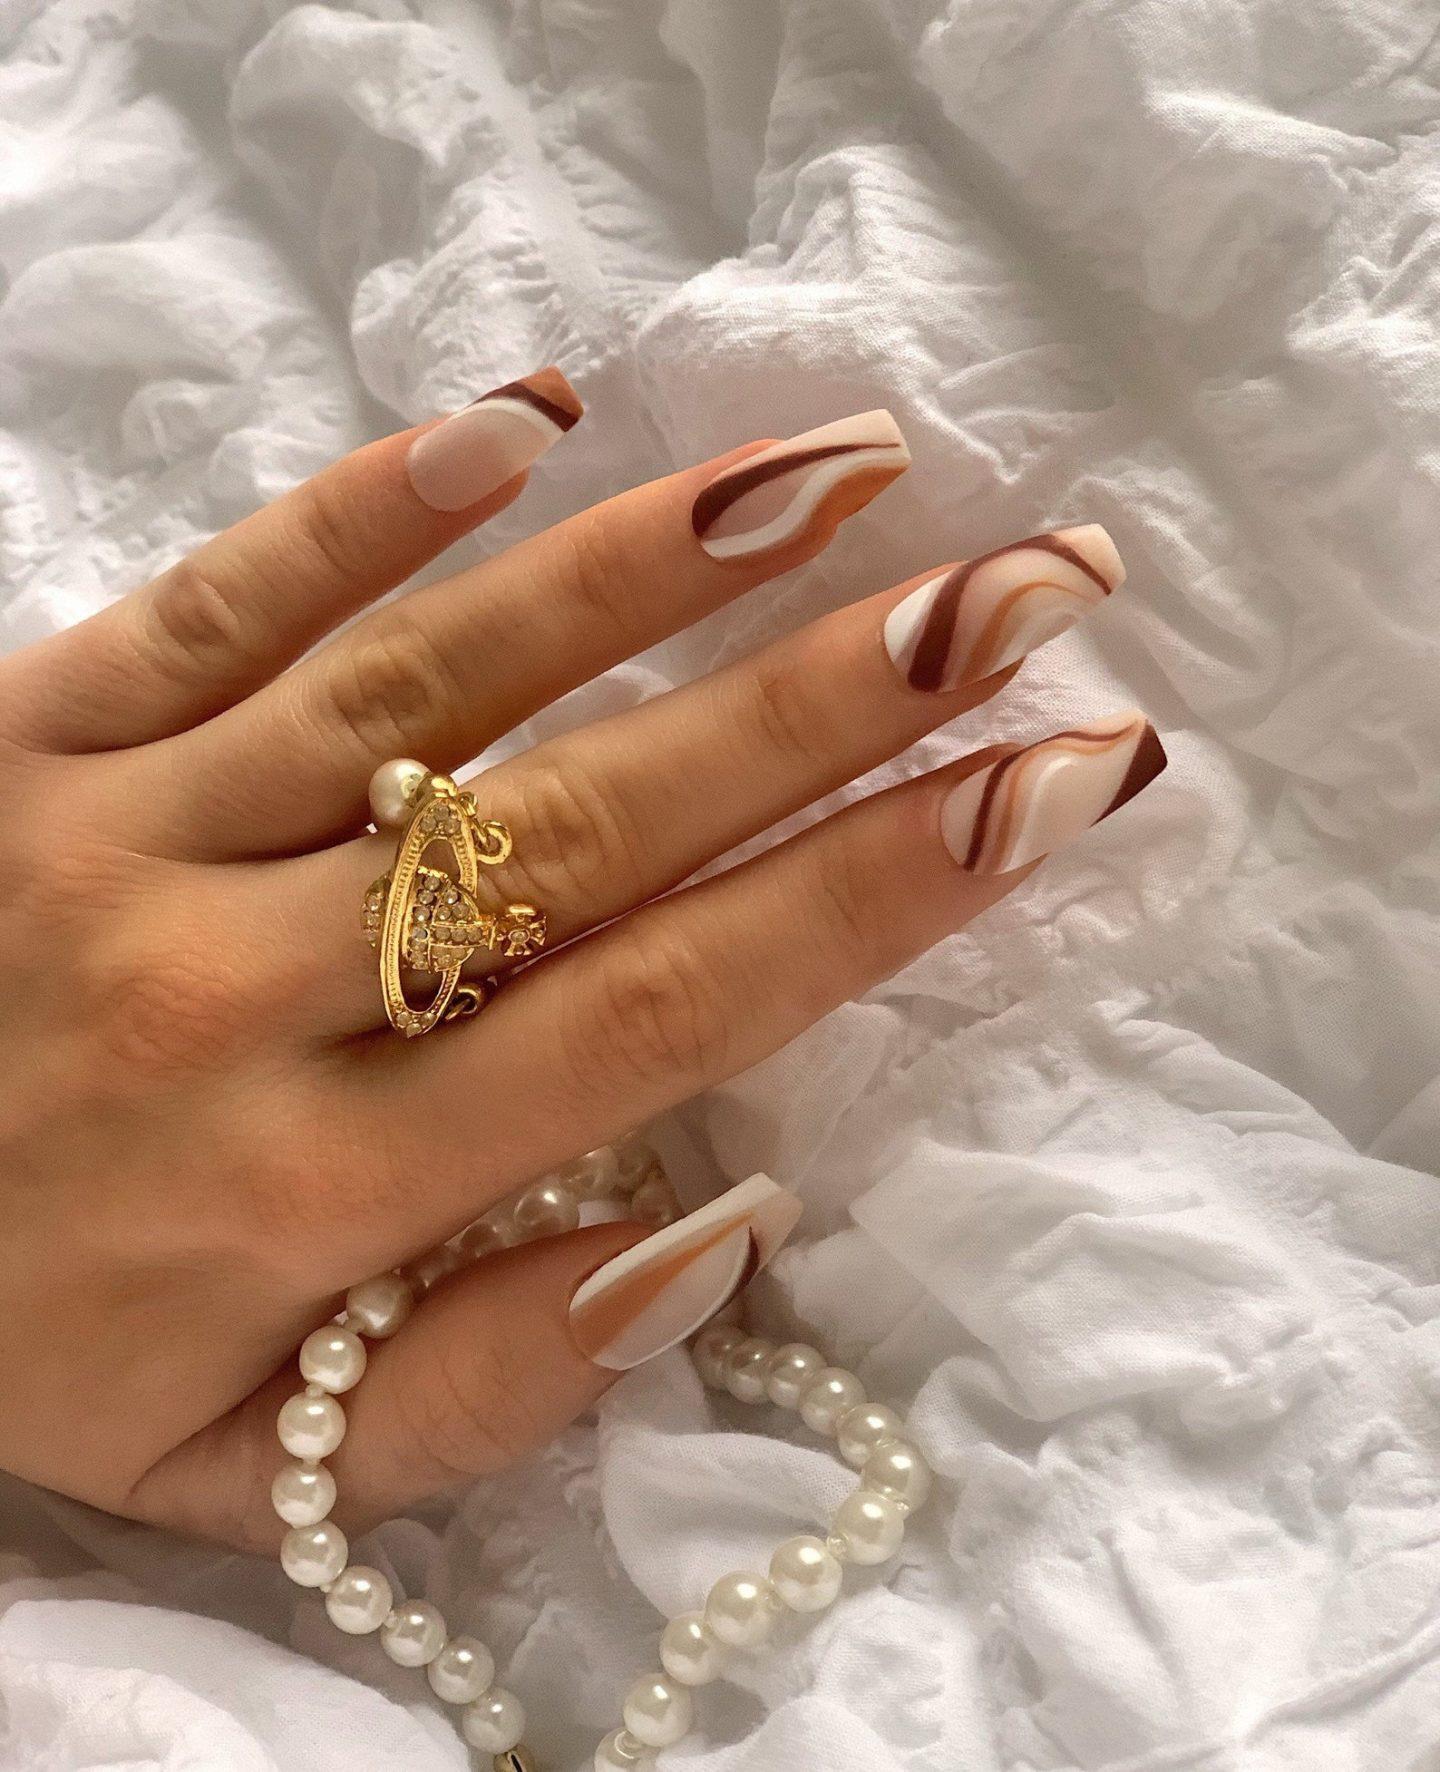 Matte brown swirl nails